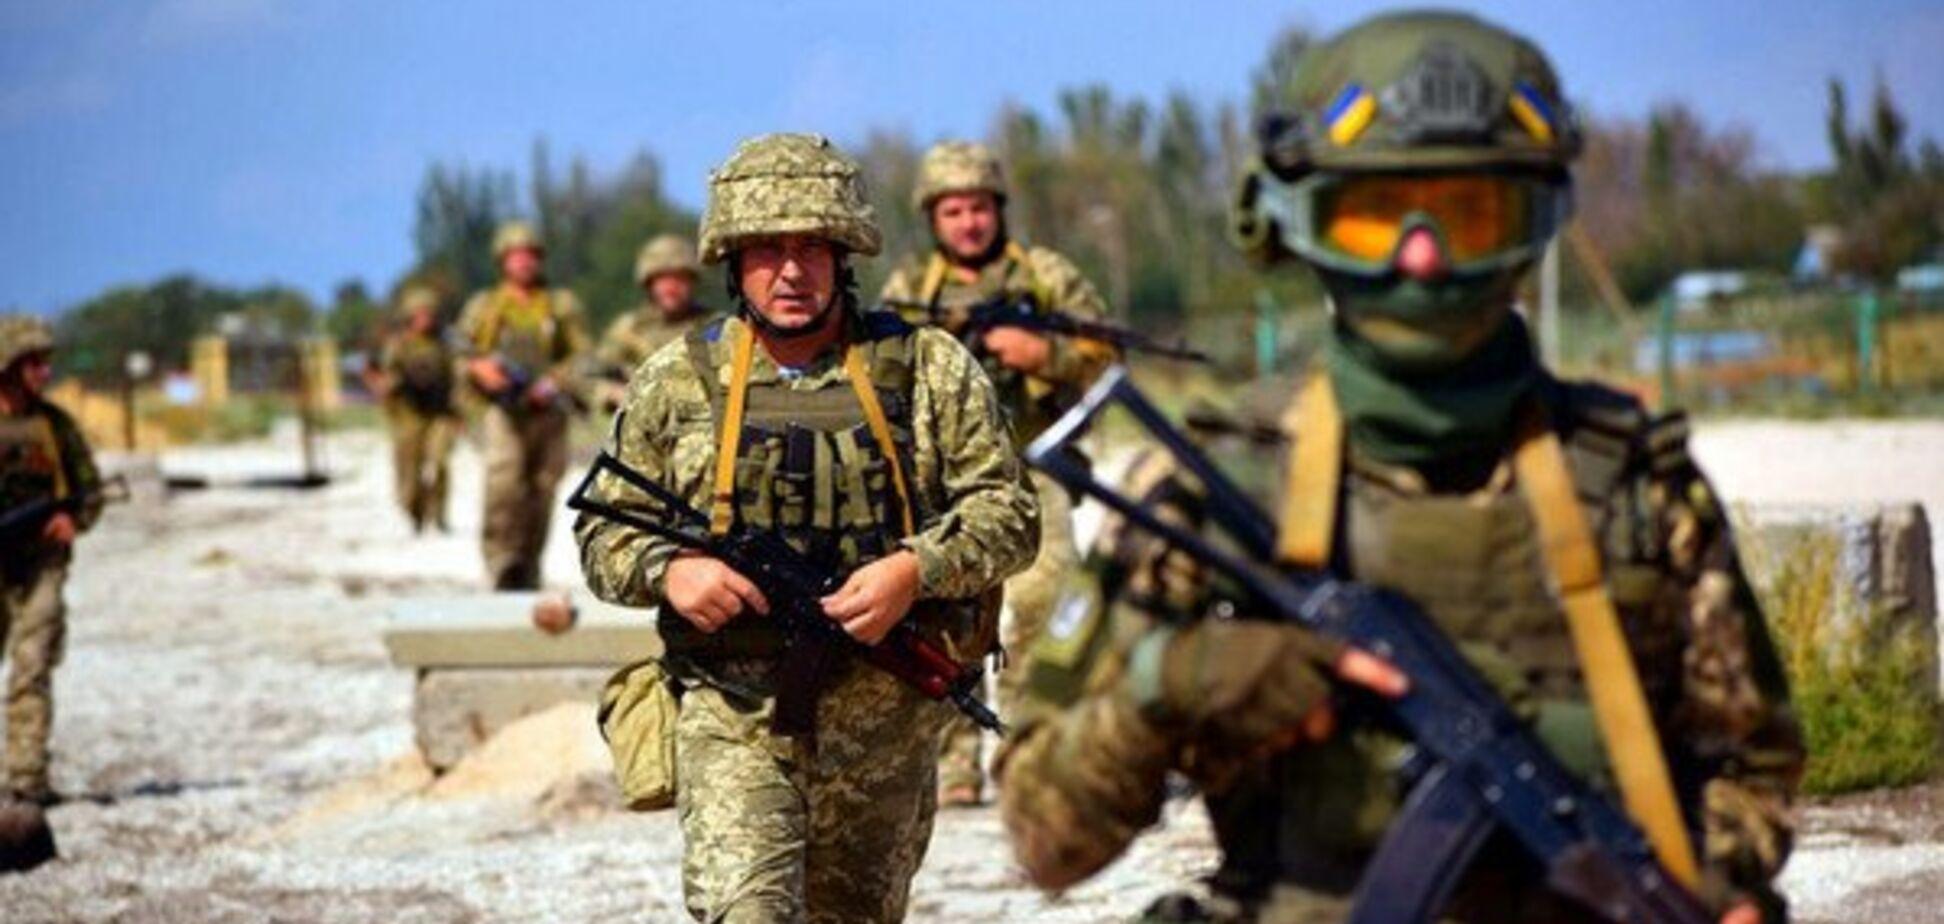 Разнесли технику и убили террористов: ВСУ отомстили 'Л/ДНР' за побратима